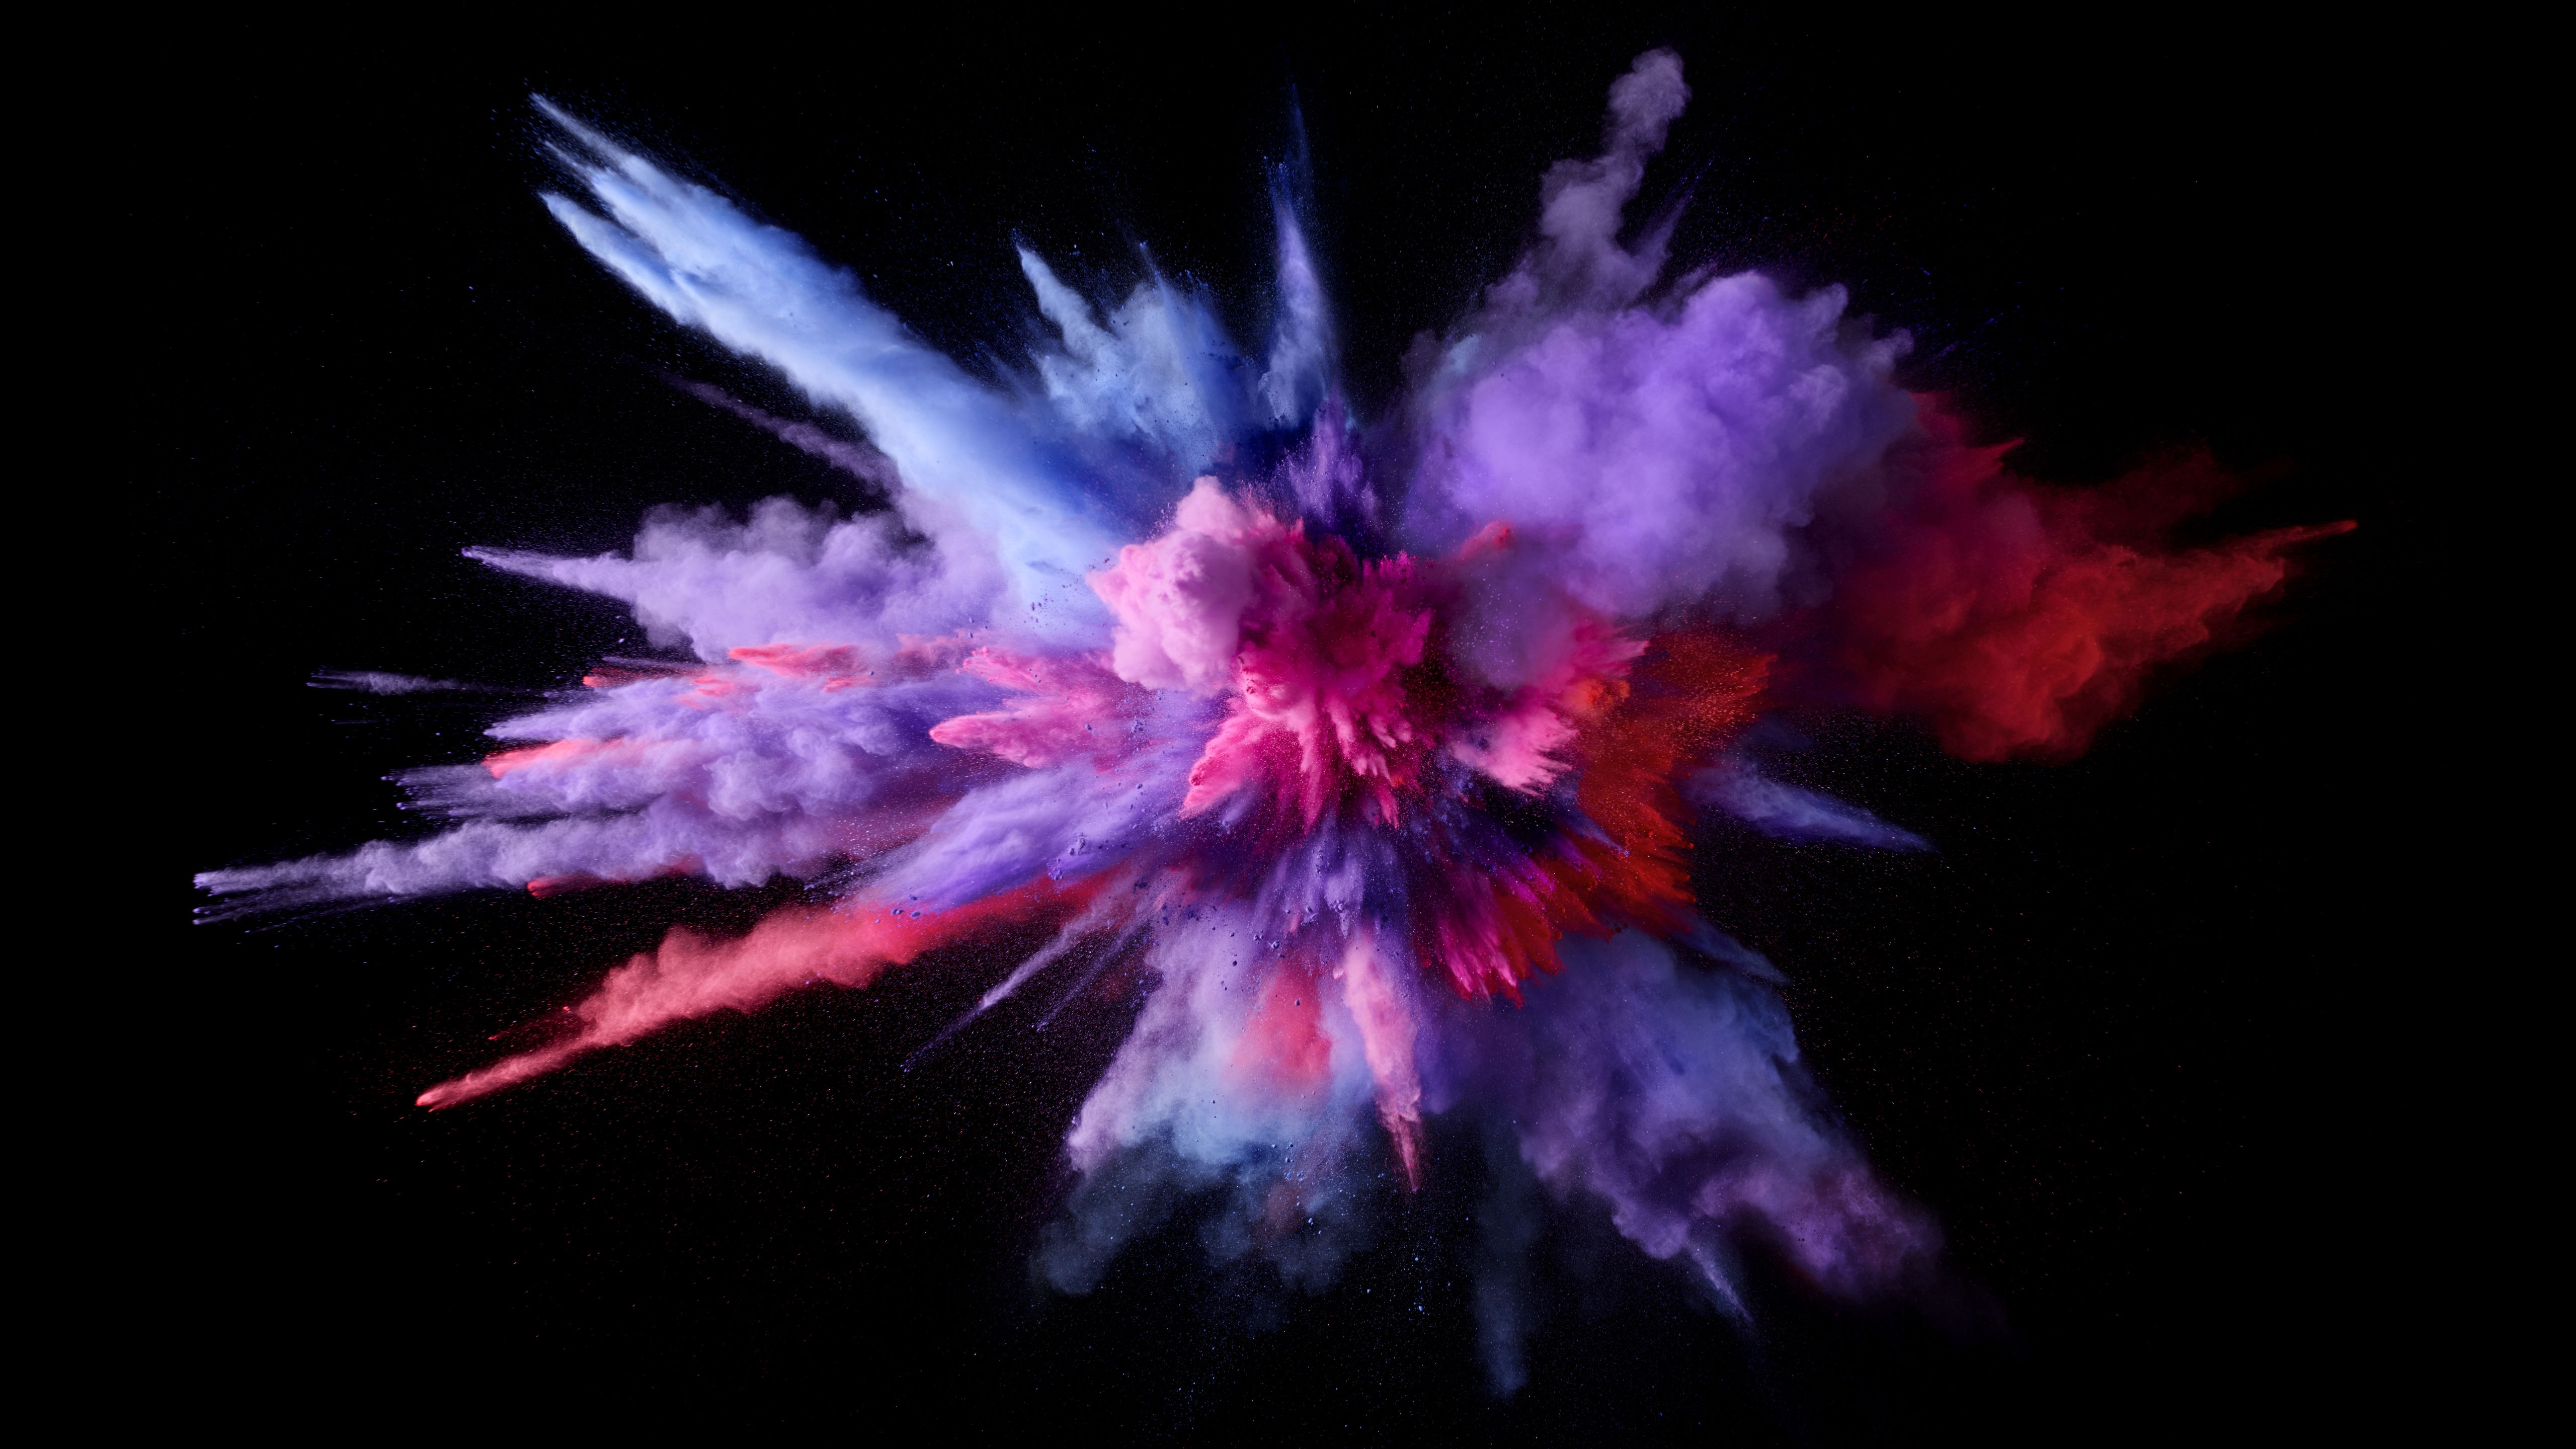 Plano De Fundo Pesquisa Google Mac Wallpaper Color Splash Purple Computer Wallpaper